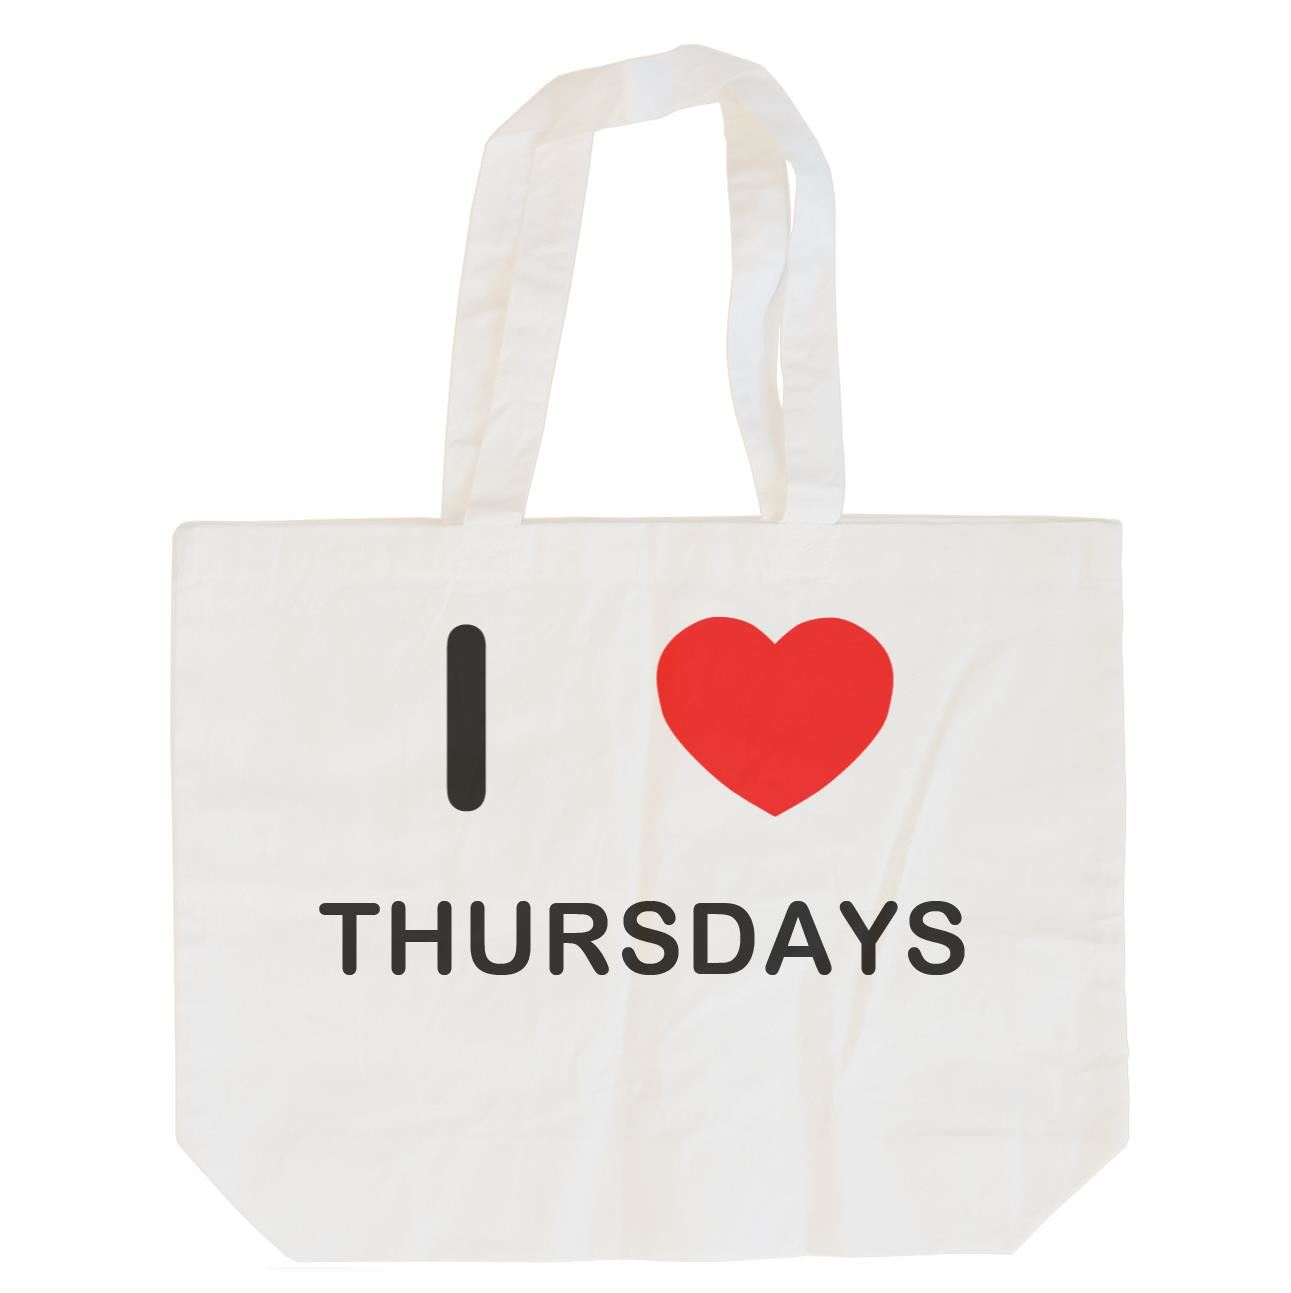 I Love Thursdays - Cotton Bag | Size choice Tote, Shopper or Sling